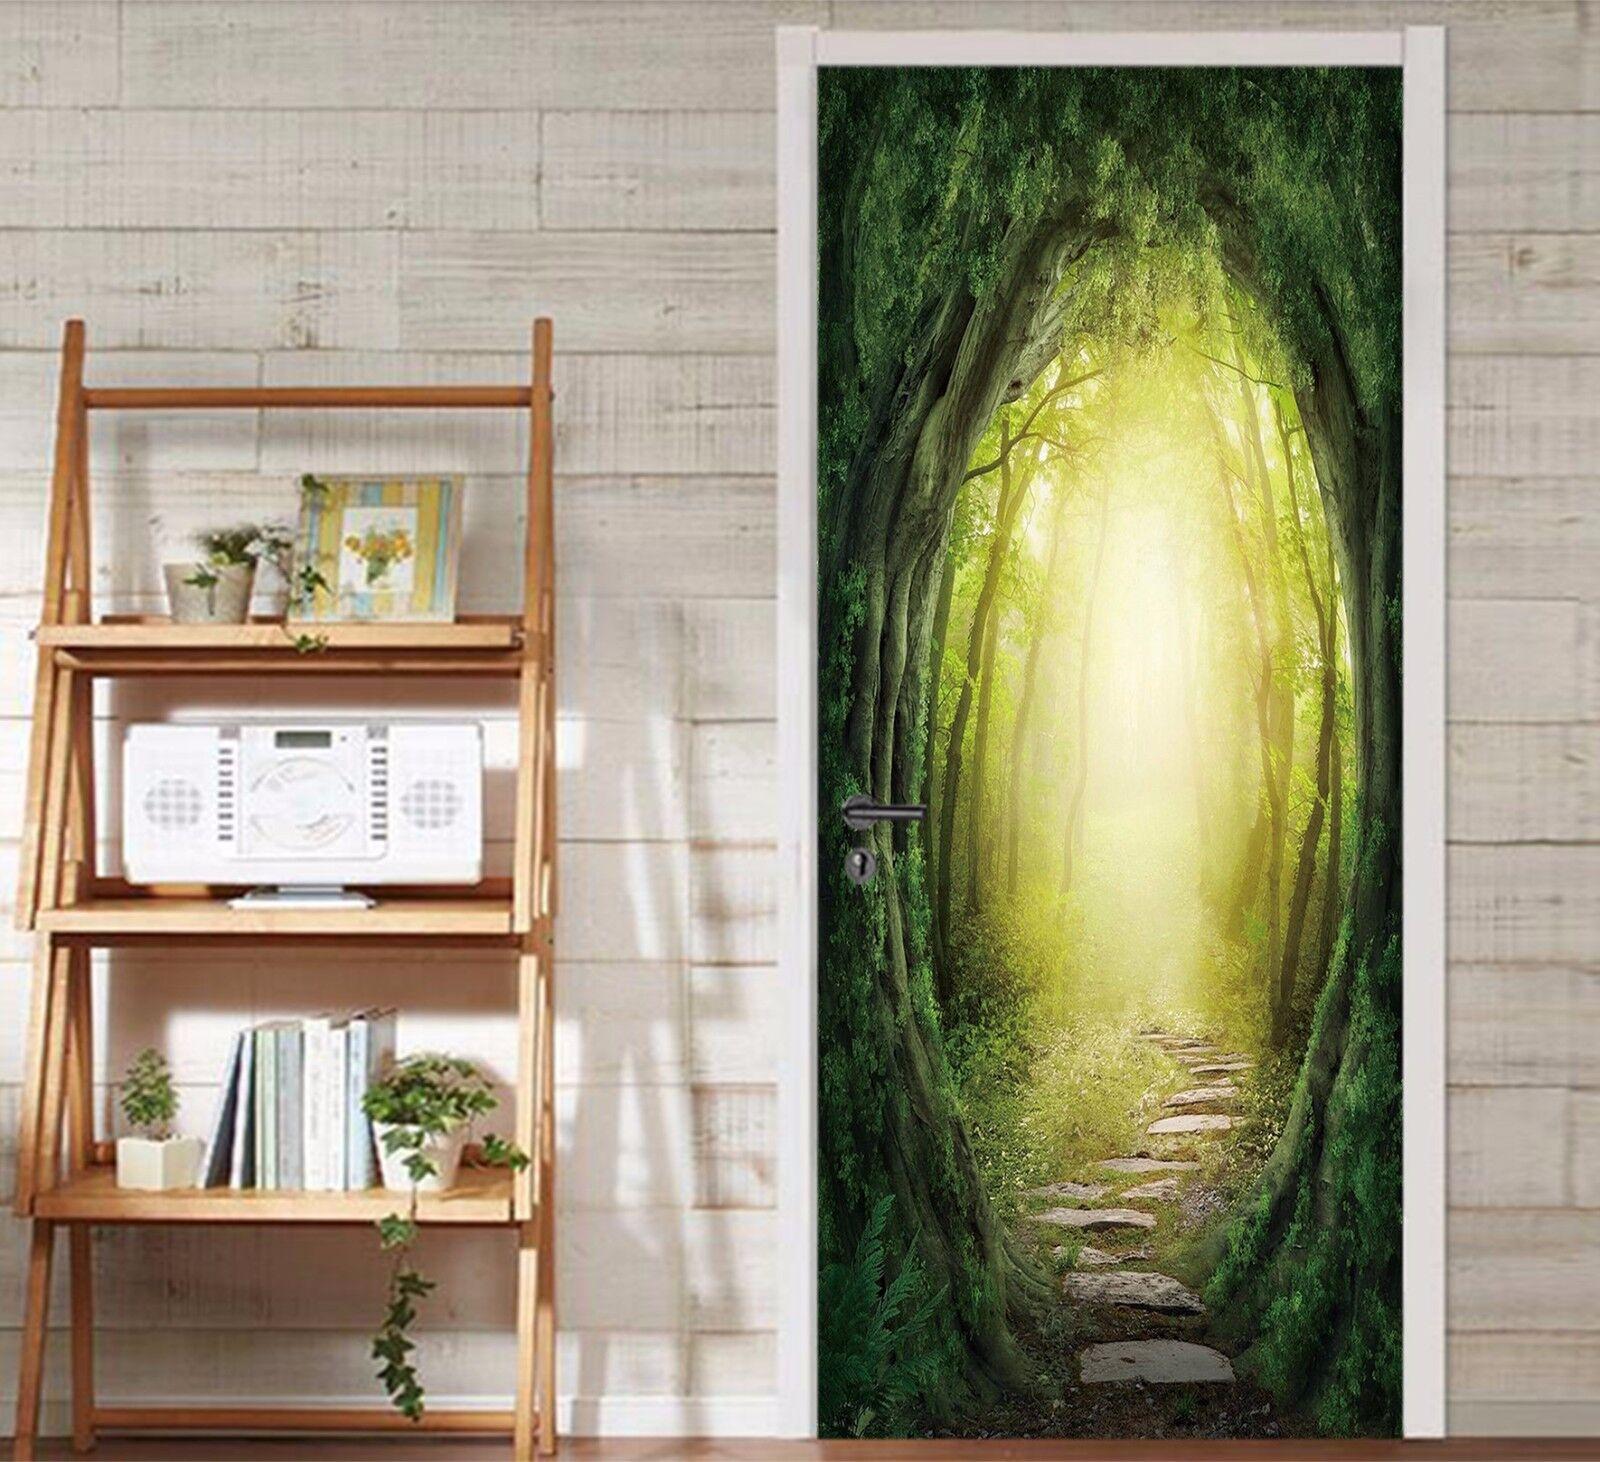 3D Baum Bogen 98 Tür Wandmalerei Wandaufkleber Aufkleber AJ WALLPAPER DE Kyra  | Verschiedene Stile  | Zarte  | Um Zuerst Unter ähnlichen Produkten Rang